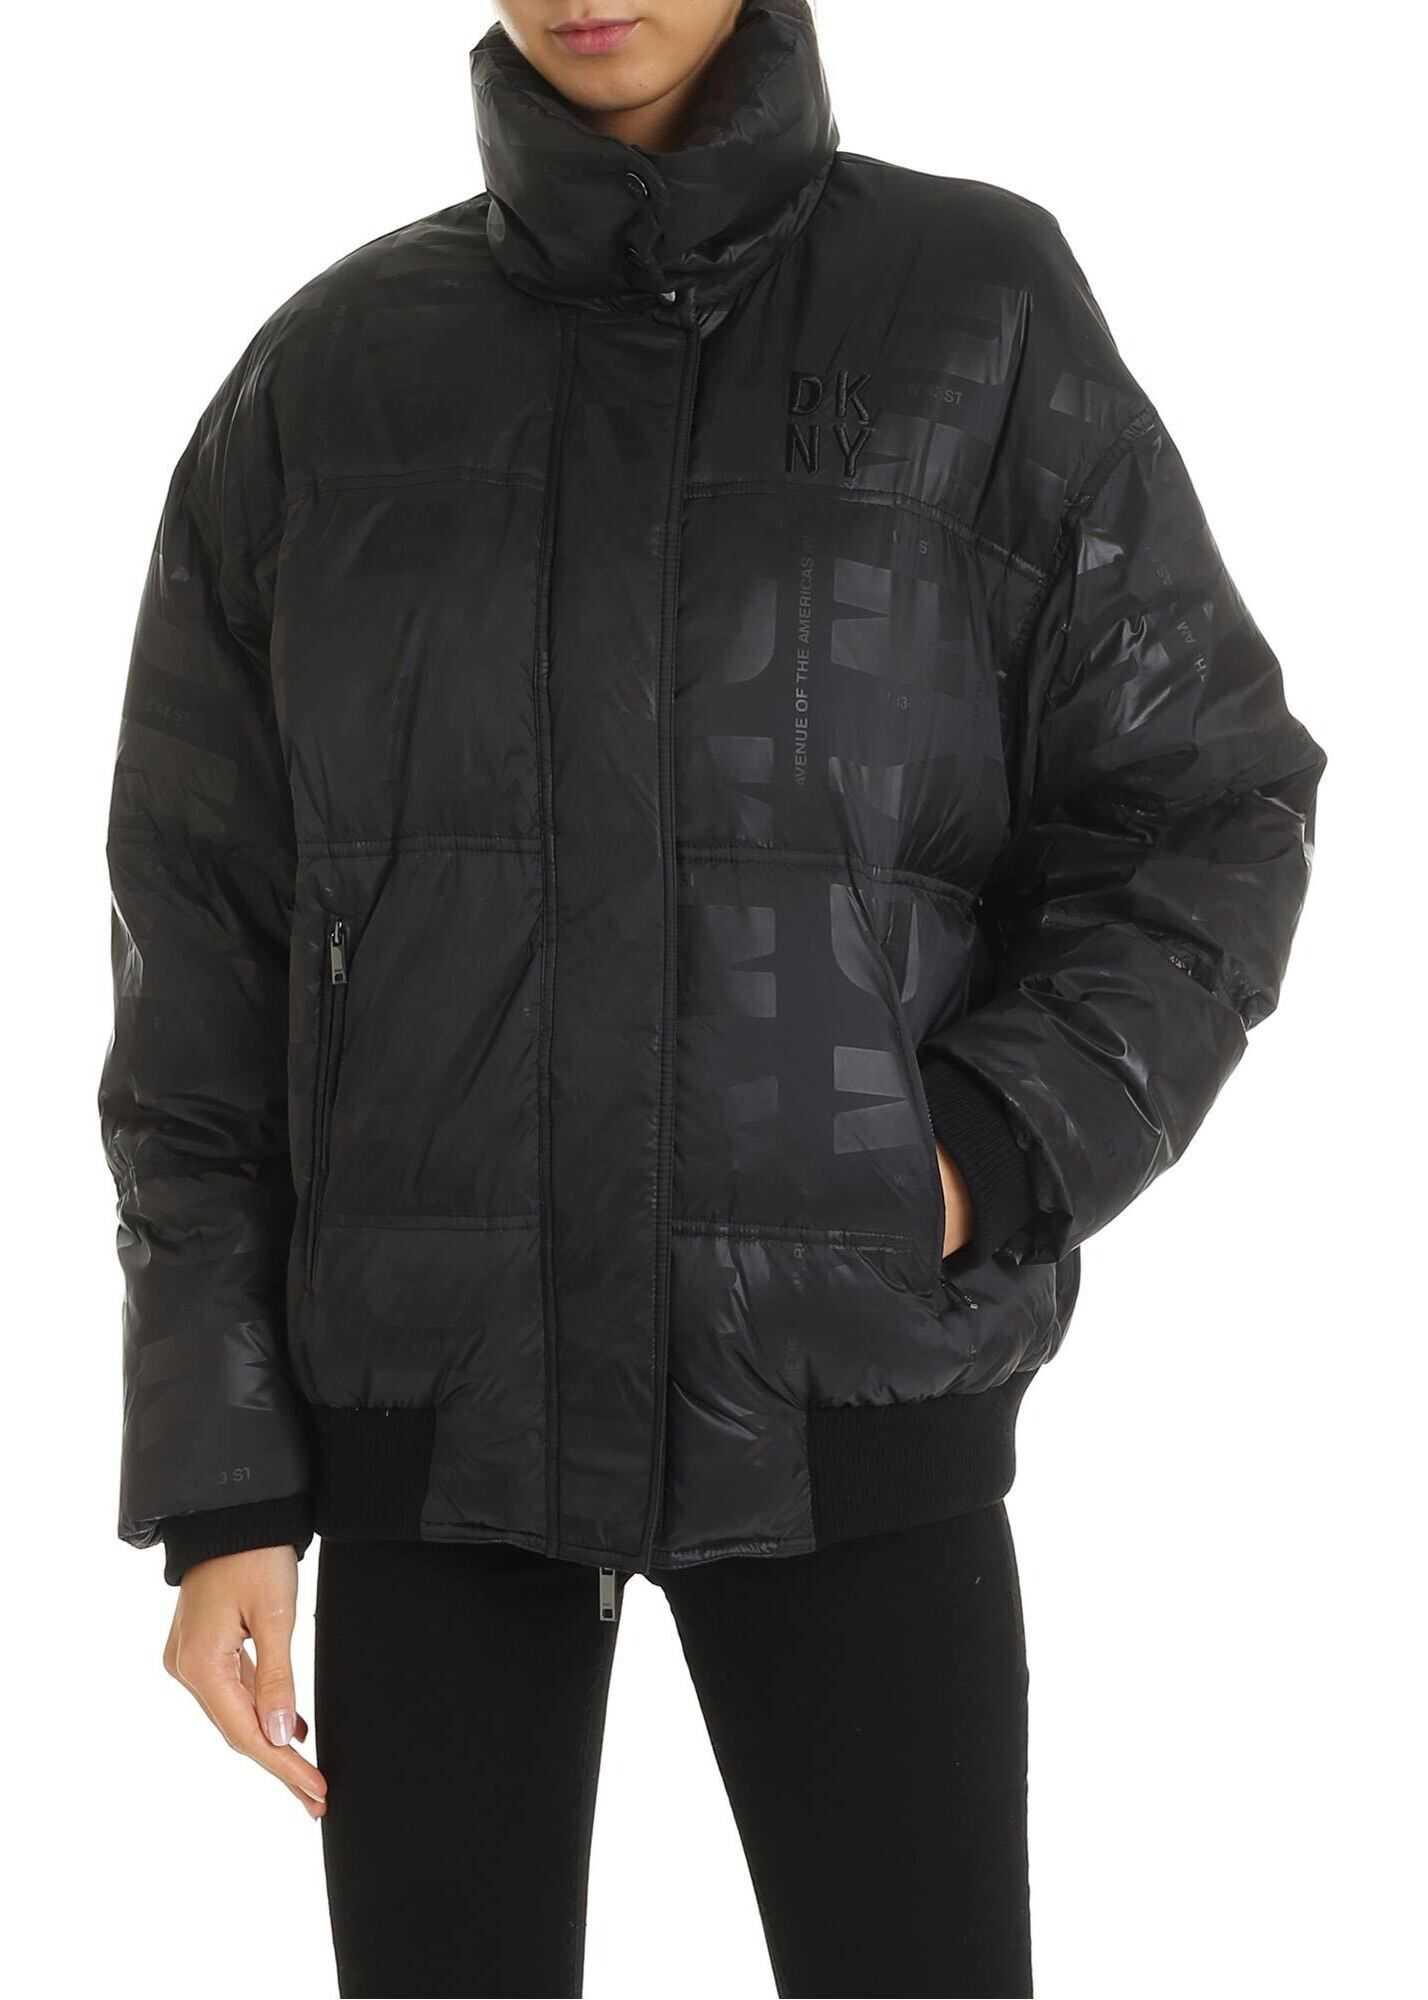 DKNY Down Jacket With Logo Prints In Black Black